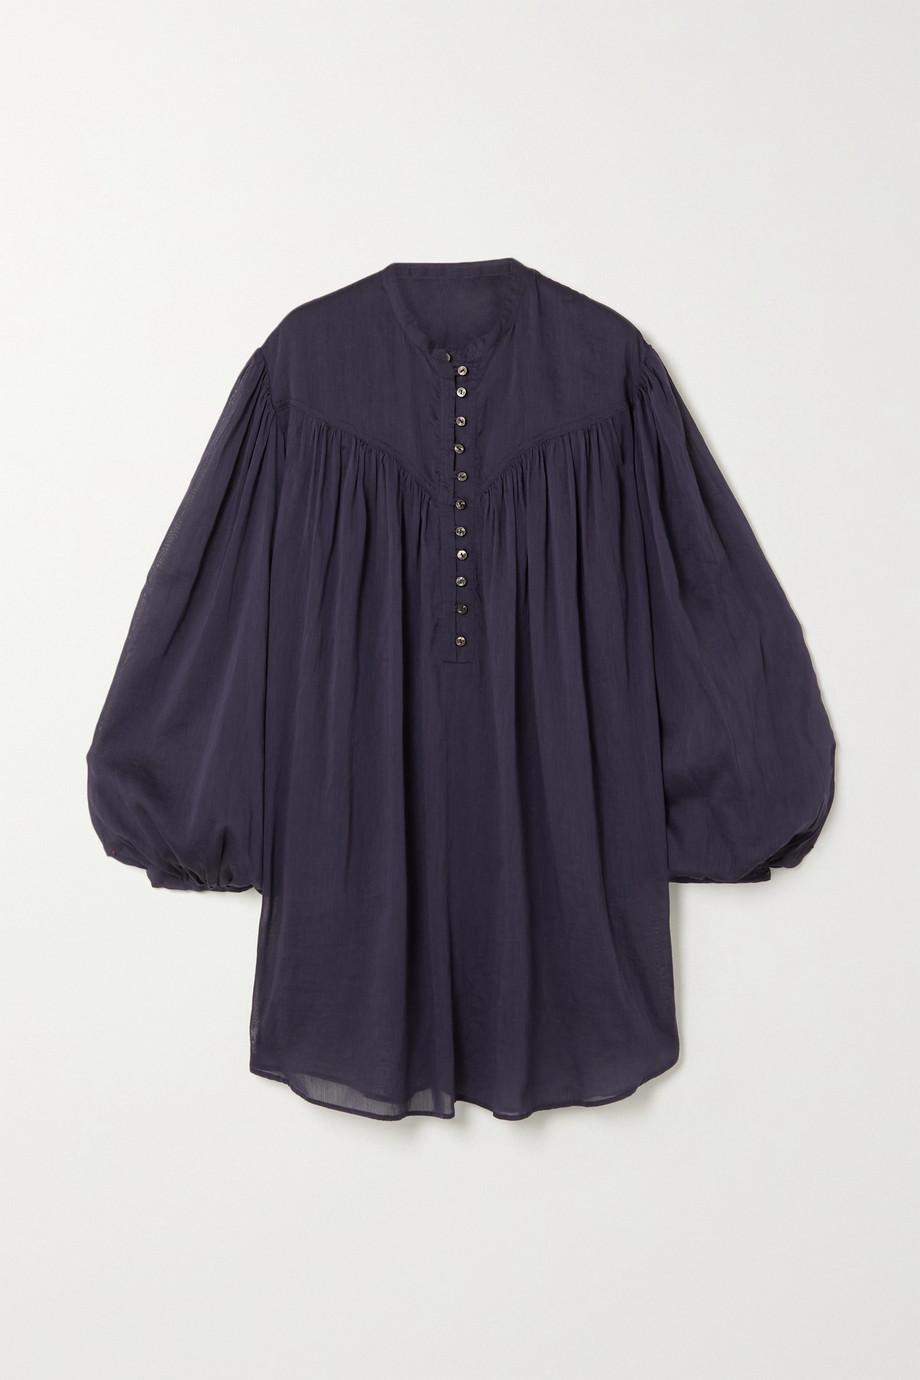 Isabel Marant Kiledia cotton and silk-blend blouse